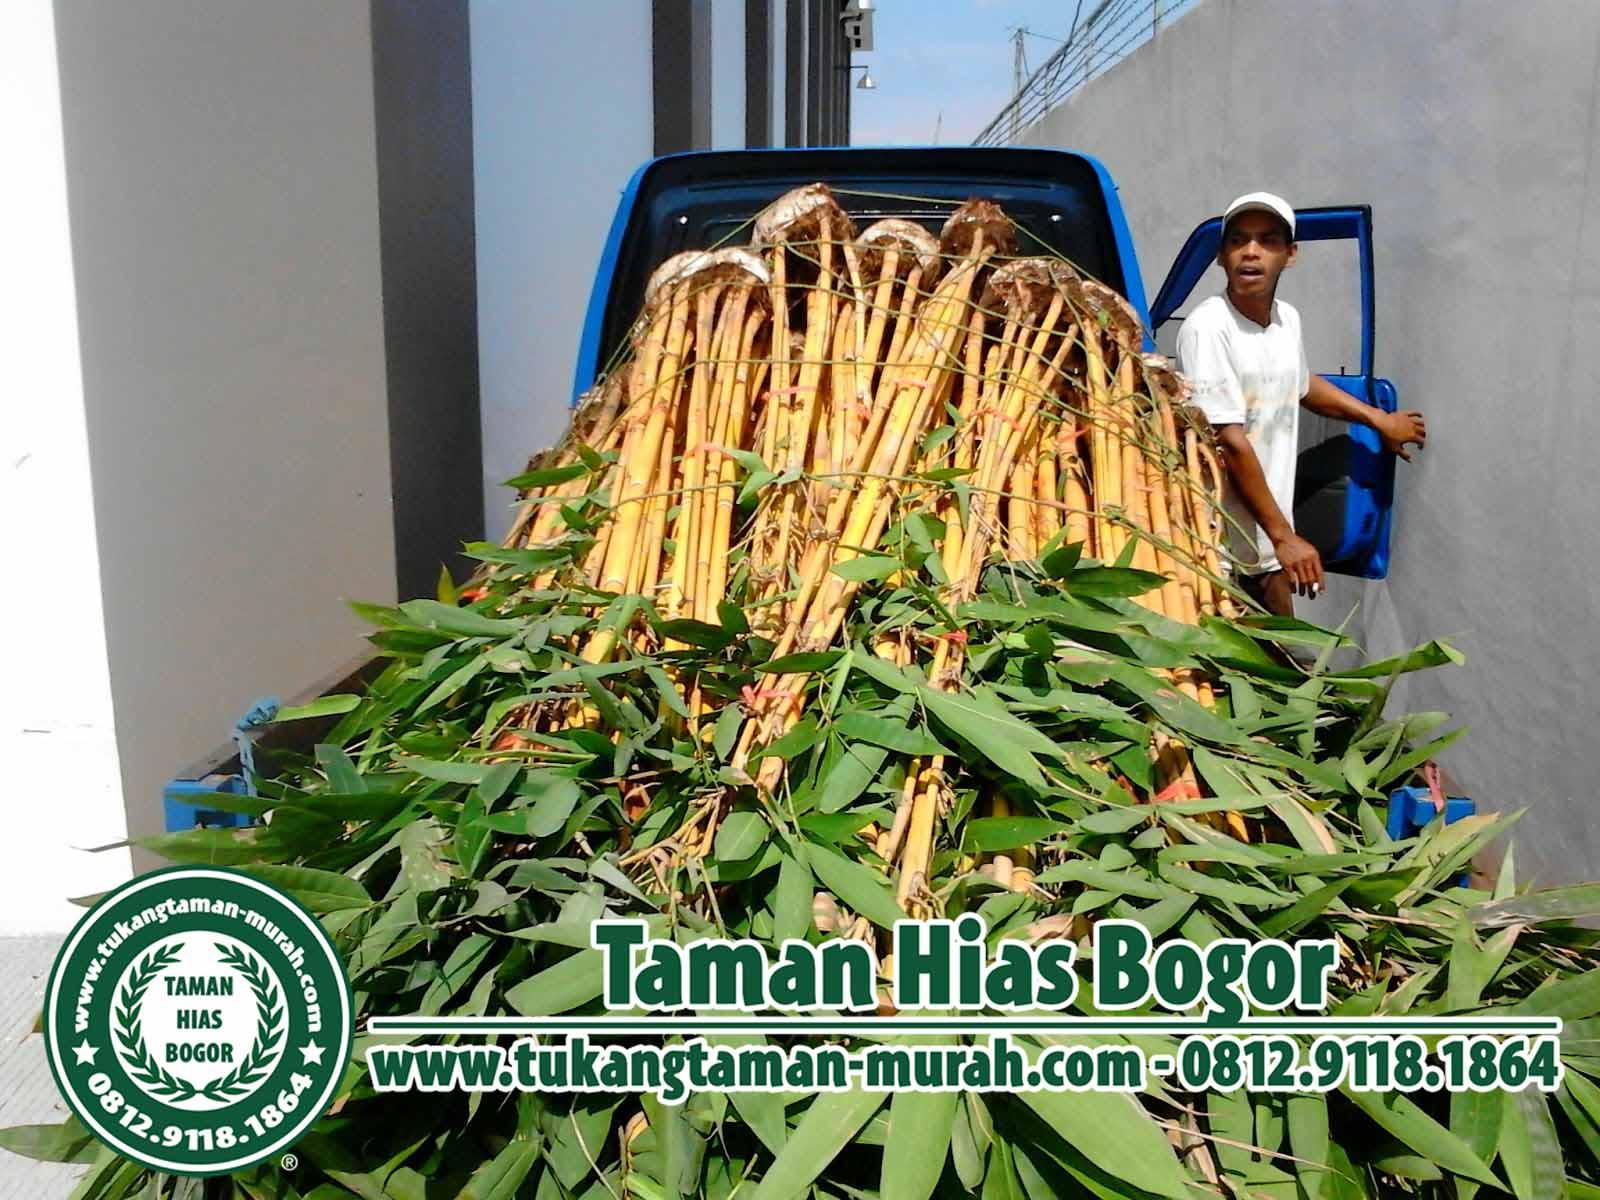 Jual Pohon Bambu Kuning Hias Tanaman Pagar Hidup Biji Rumput Kamis 03 September 2015